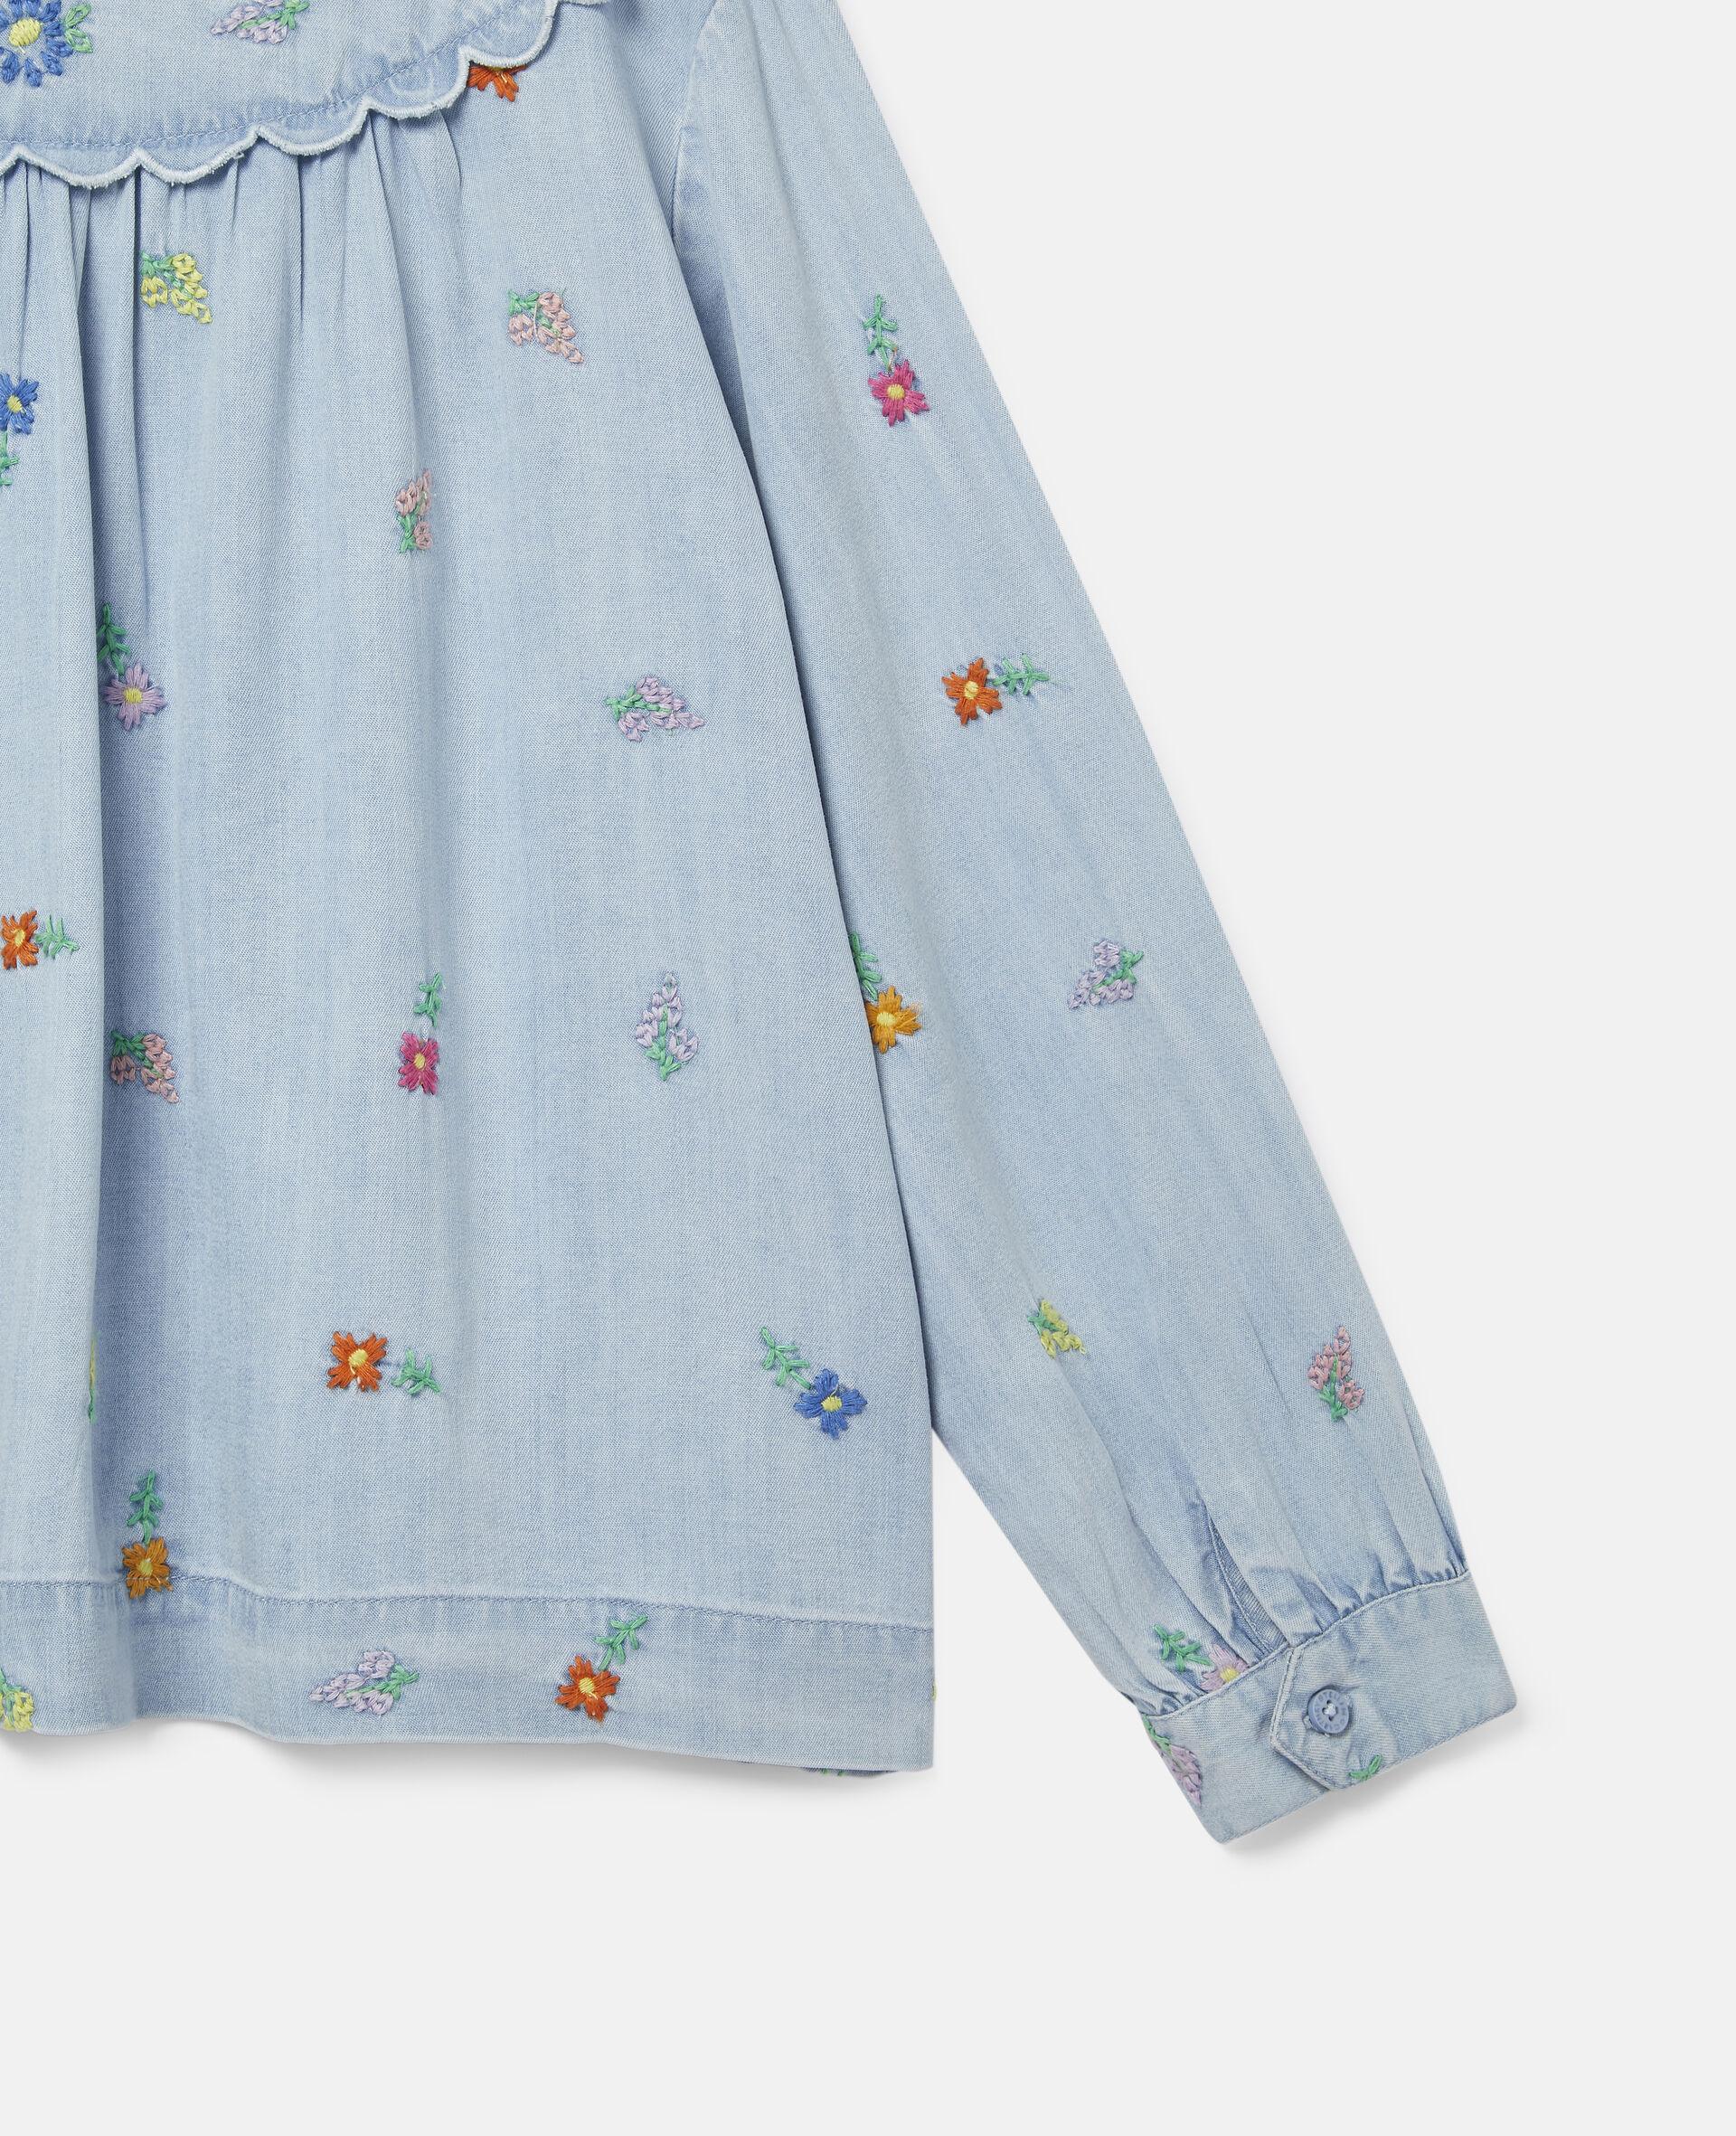 Chemise en denim à fleurs brodées-Bleu-large image number 1